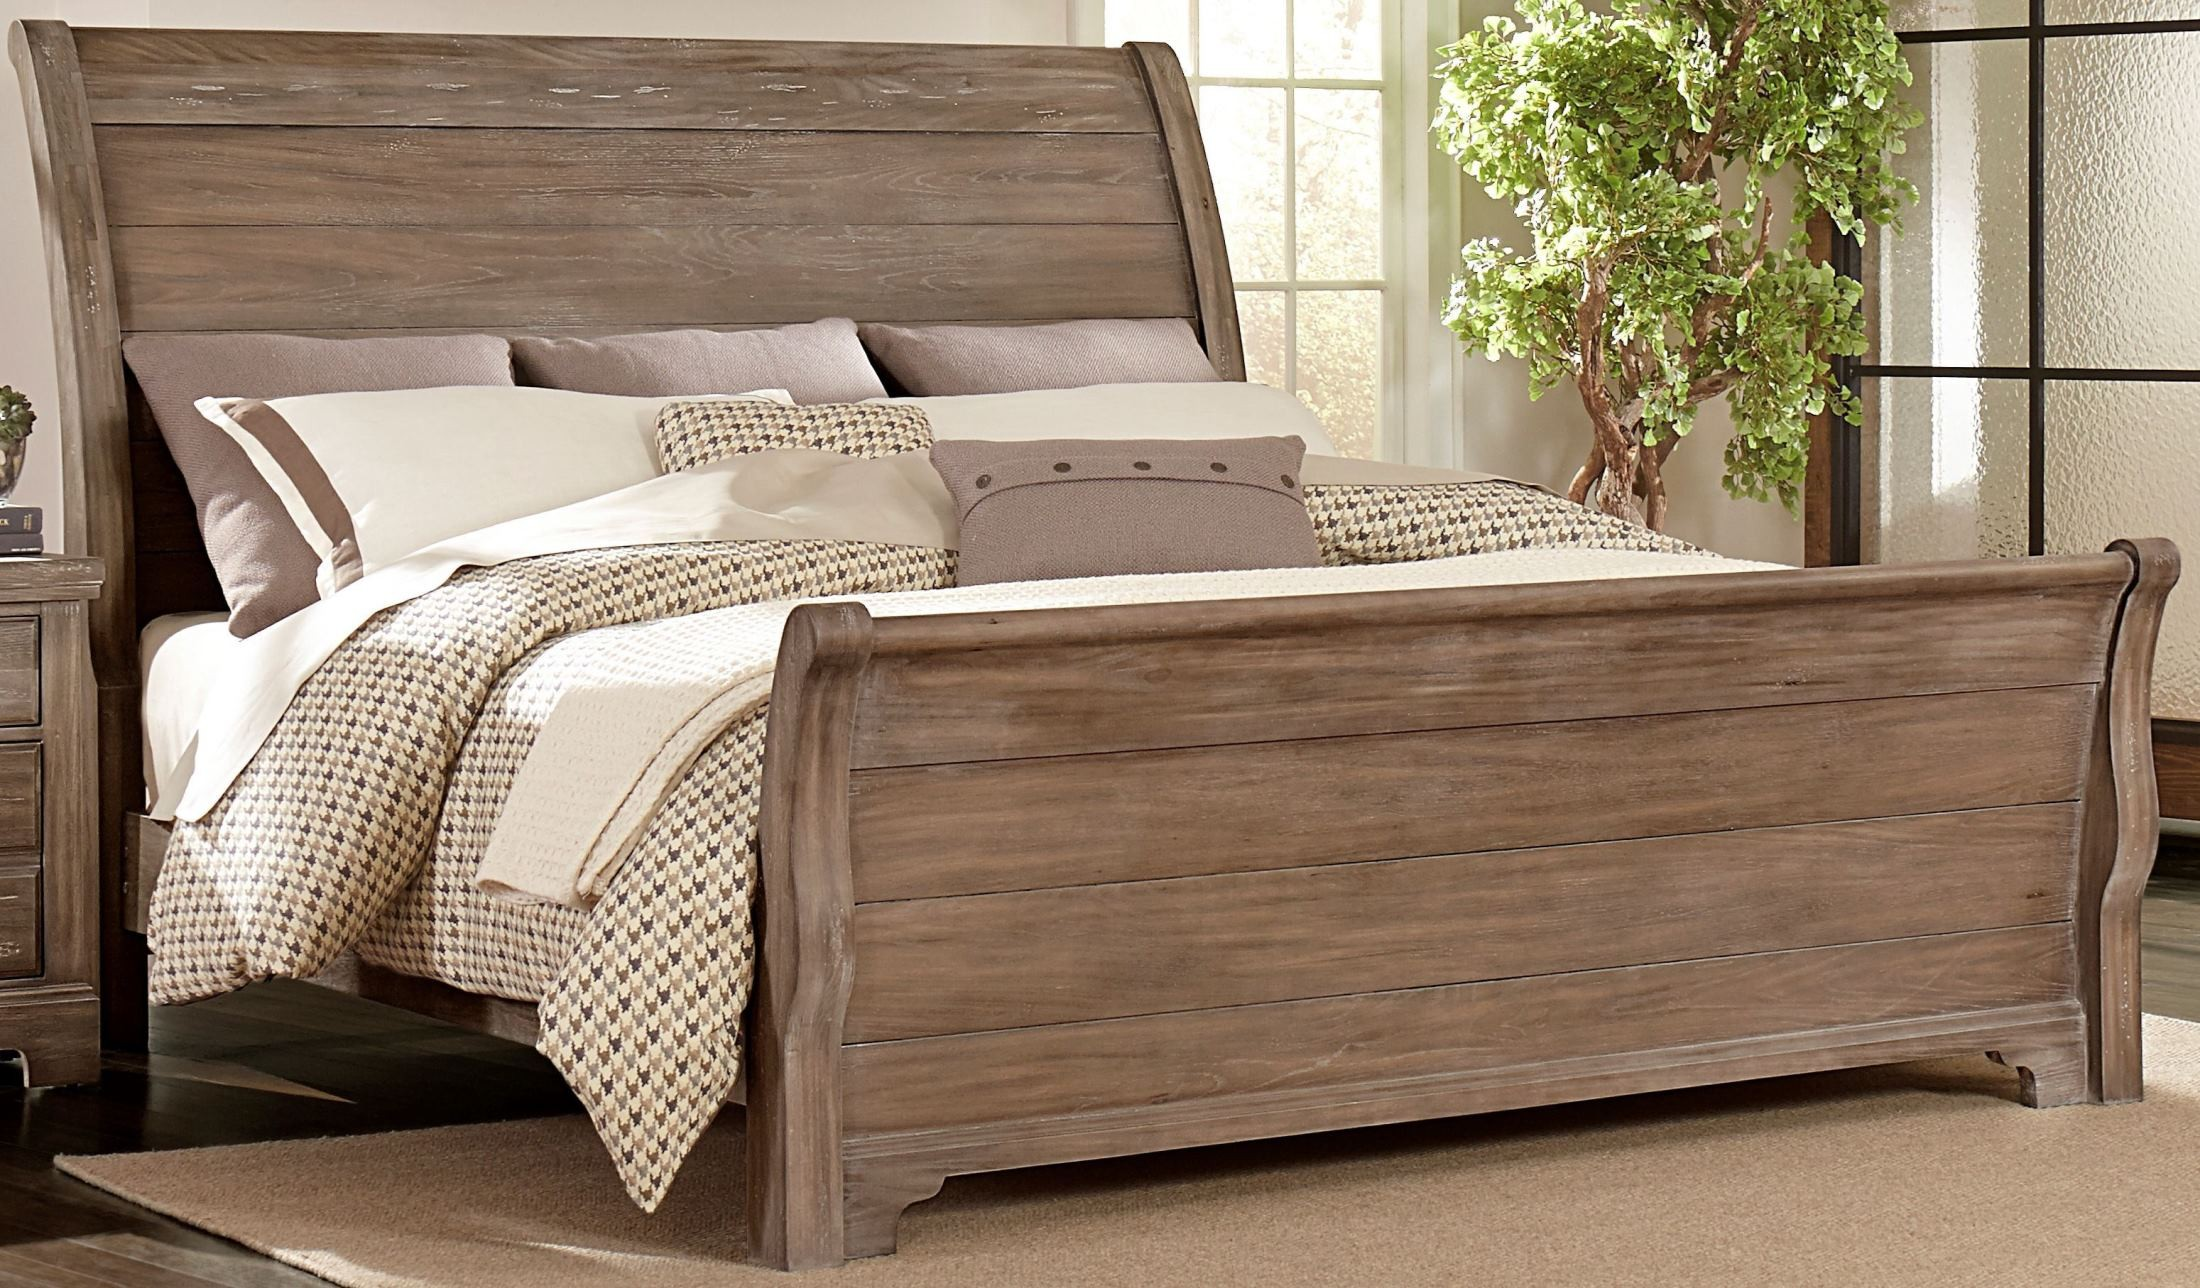 Whiskey Barrel Rustic Gray Sleigh Bedroom Set From Vaughn Bassett Coleman Furniture